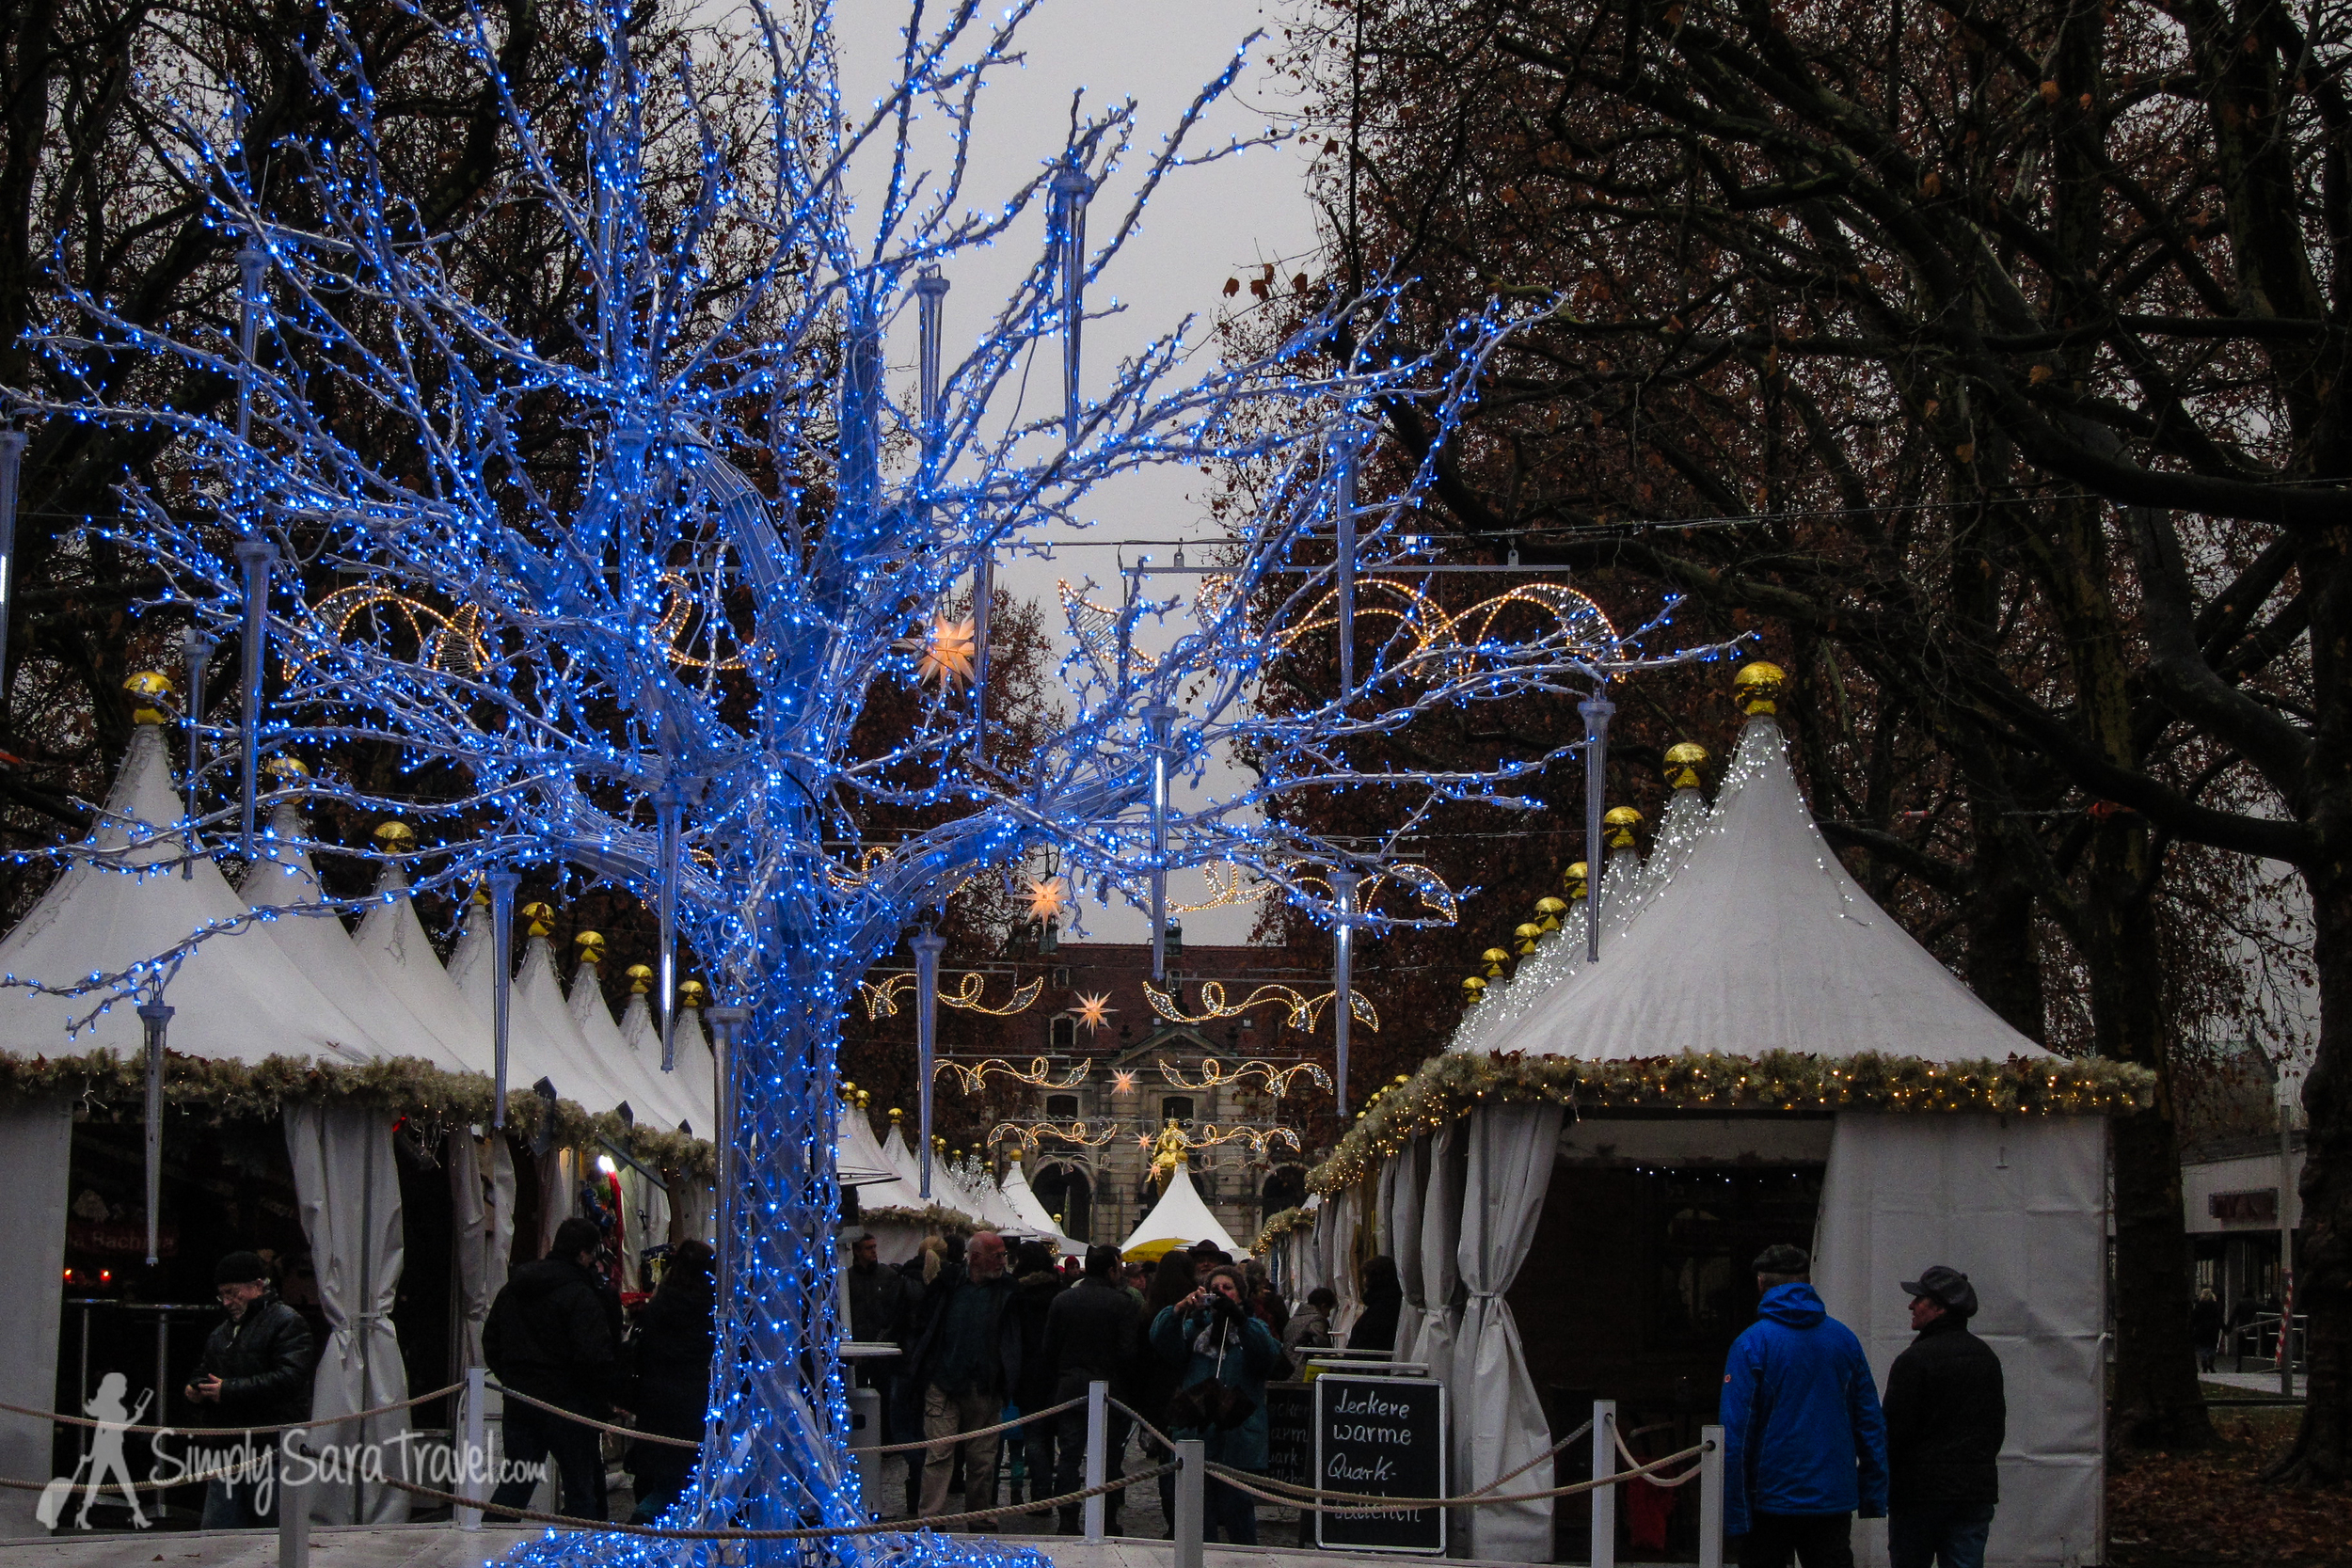 Another look at the international  Augustusmarkt  in Dresden